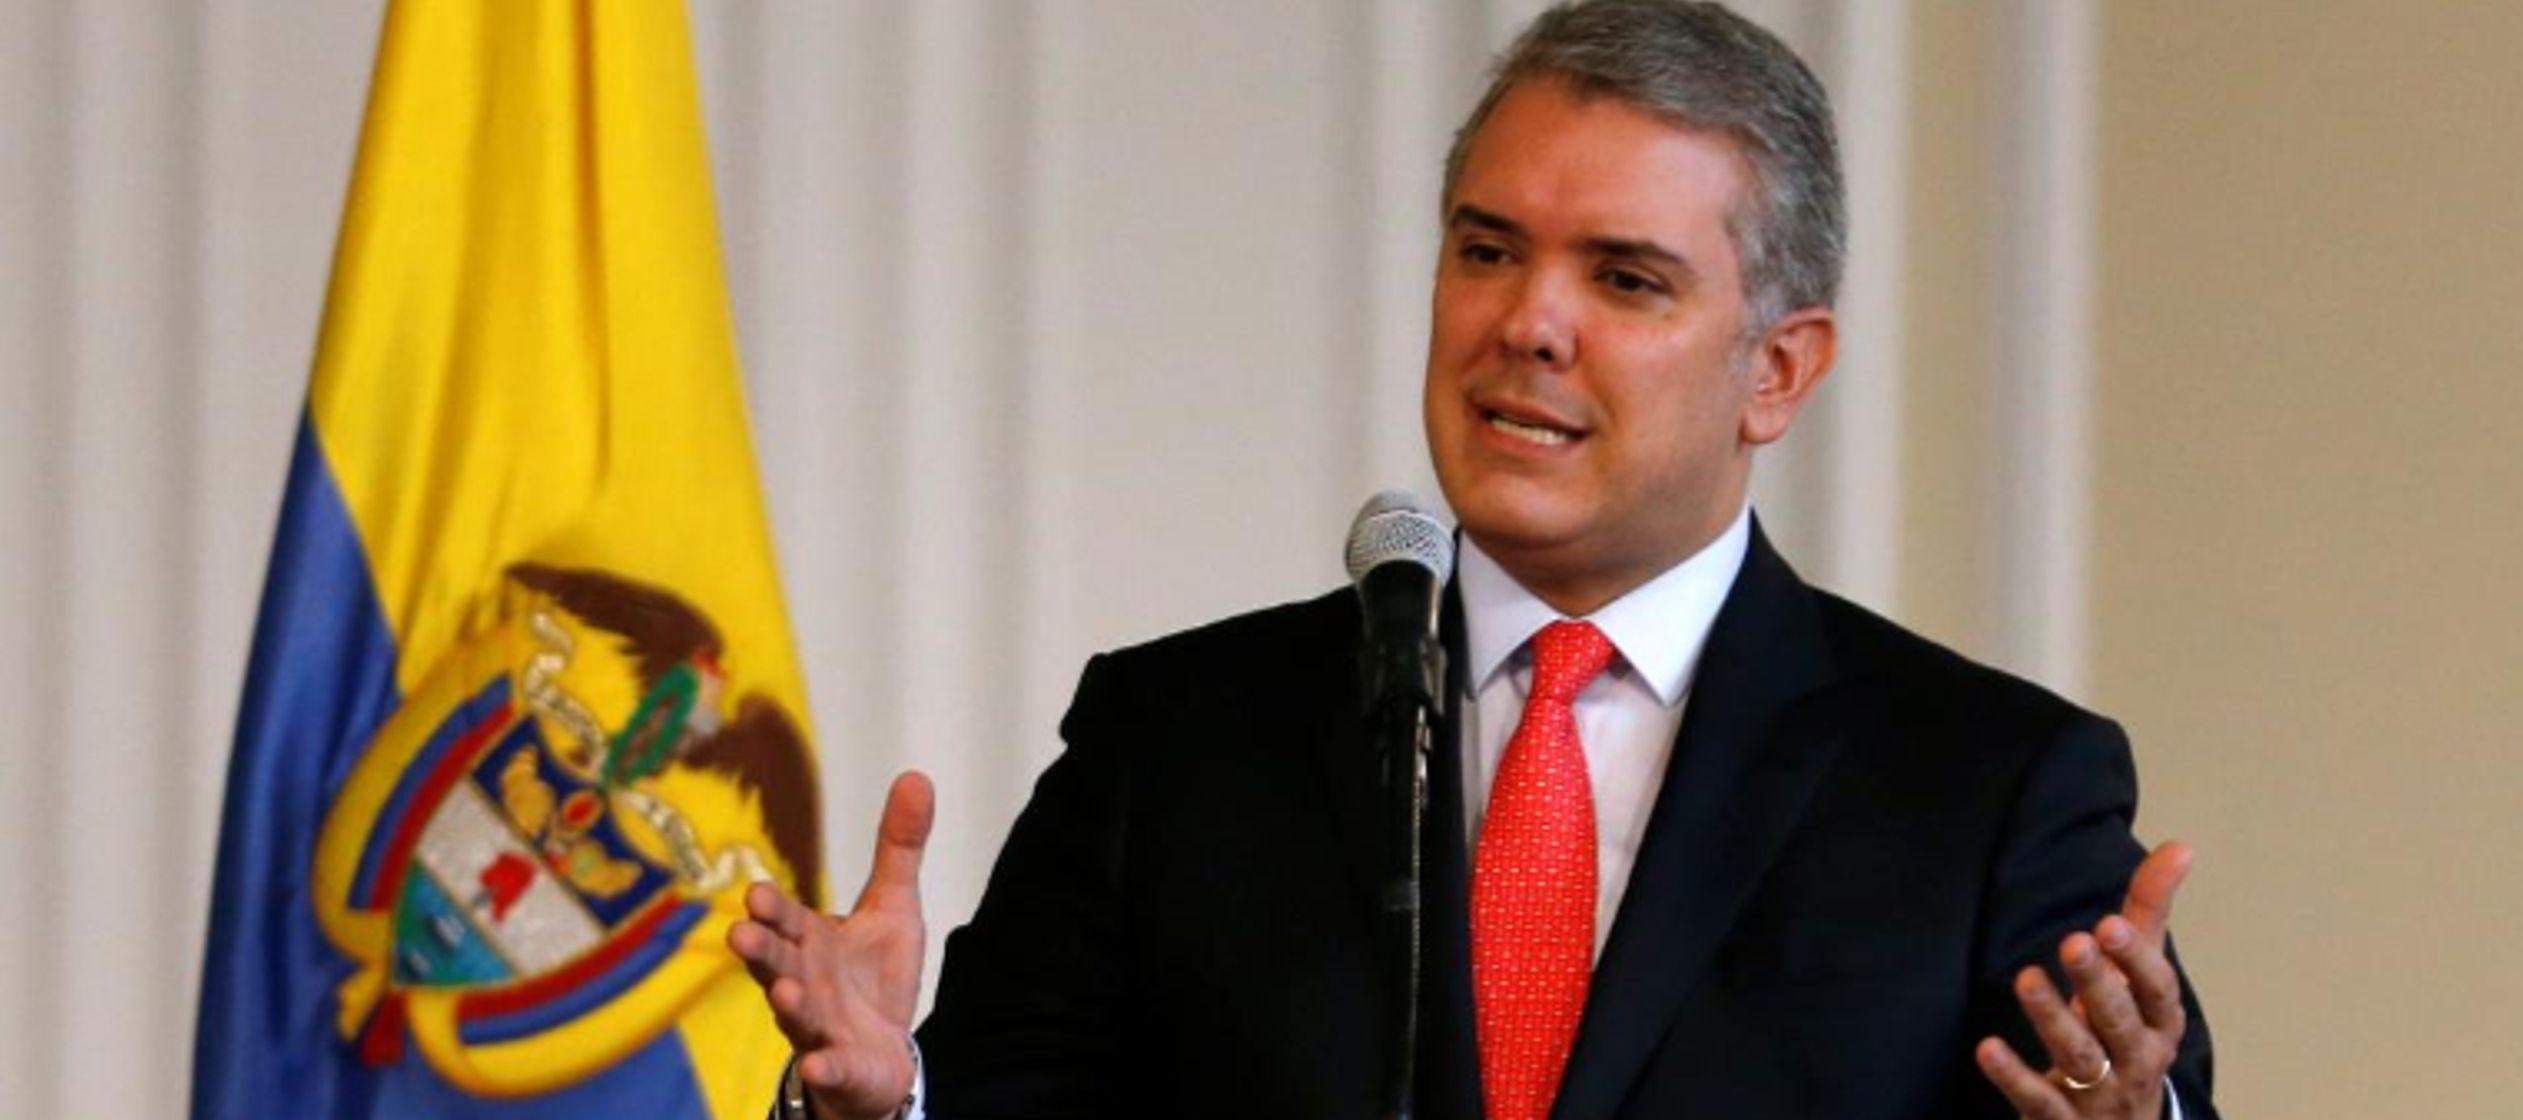 Presidente de Colombia critica maniobras militares de Venezuela con Rusia